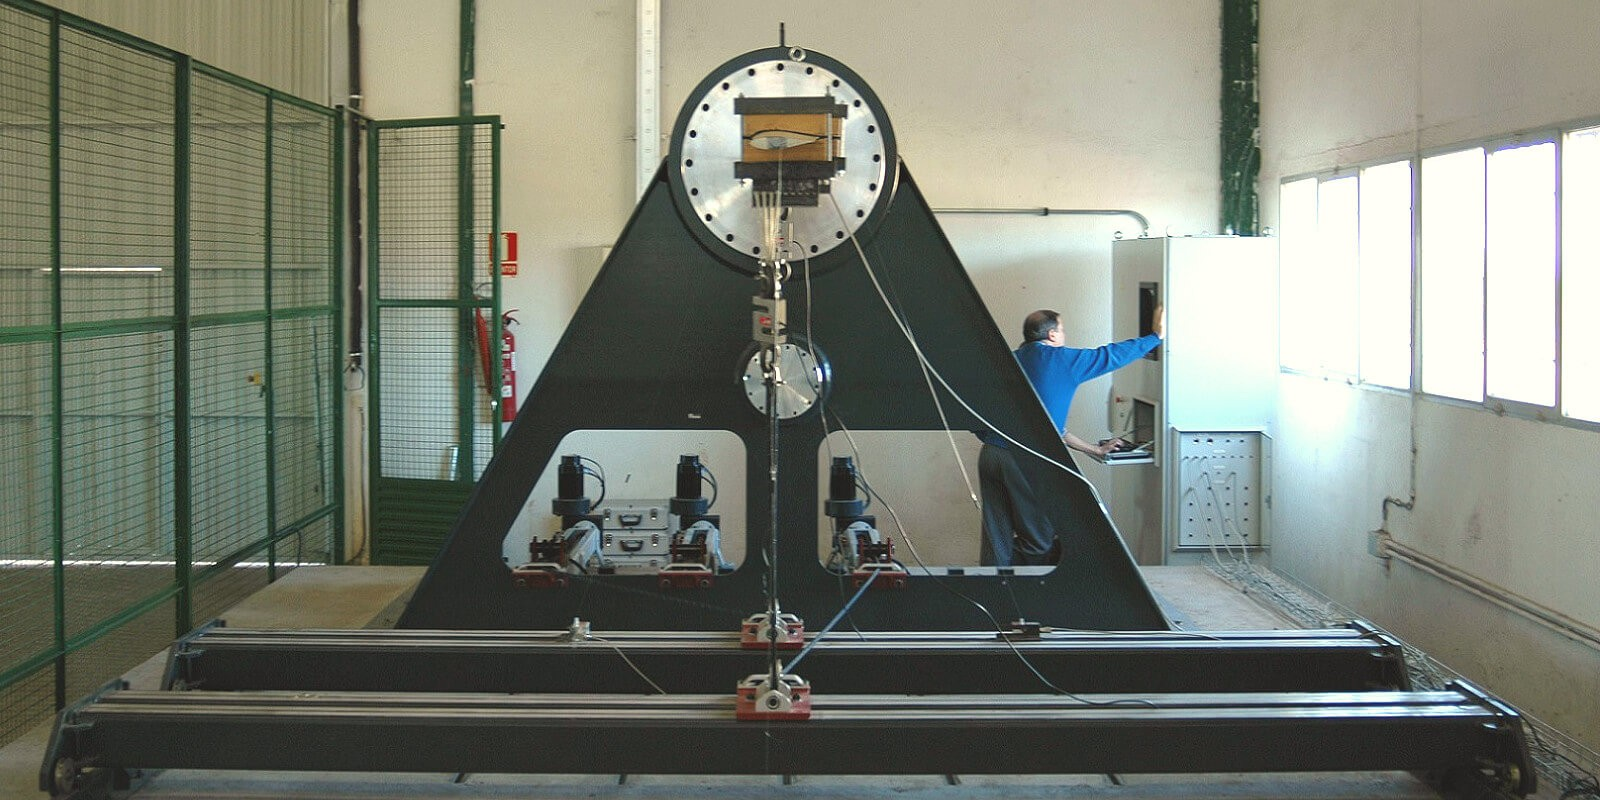 CIEMAT_Test_Bench_Renewable_Energy_Facilities_Windturbine_Spain_IDOM_03